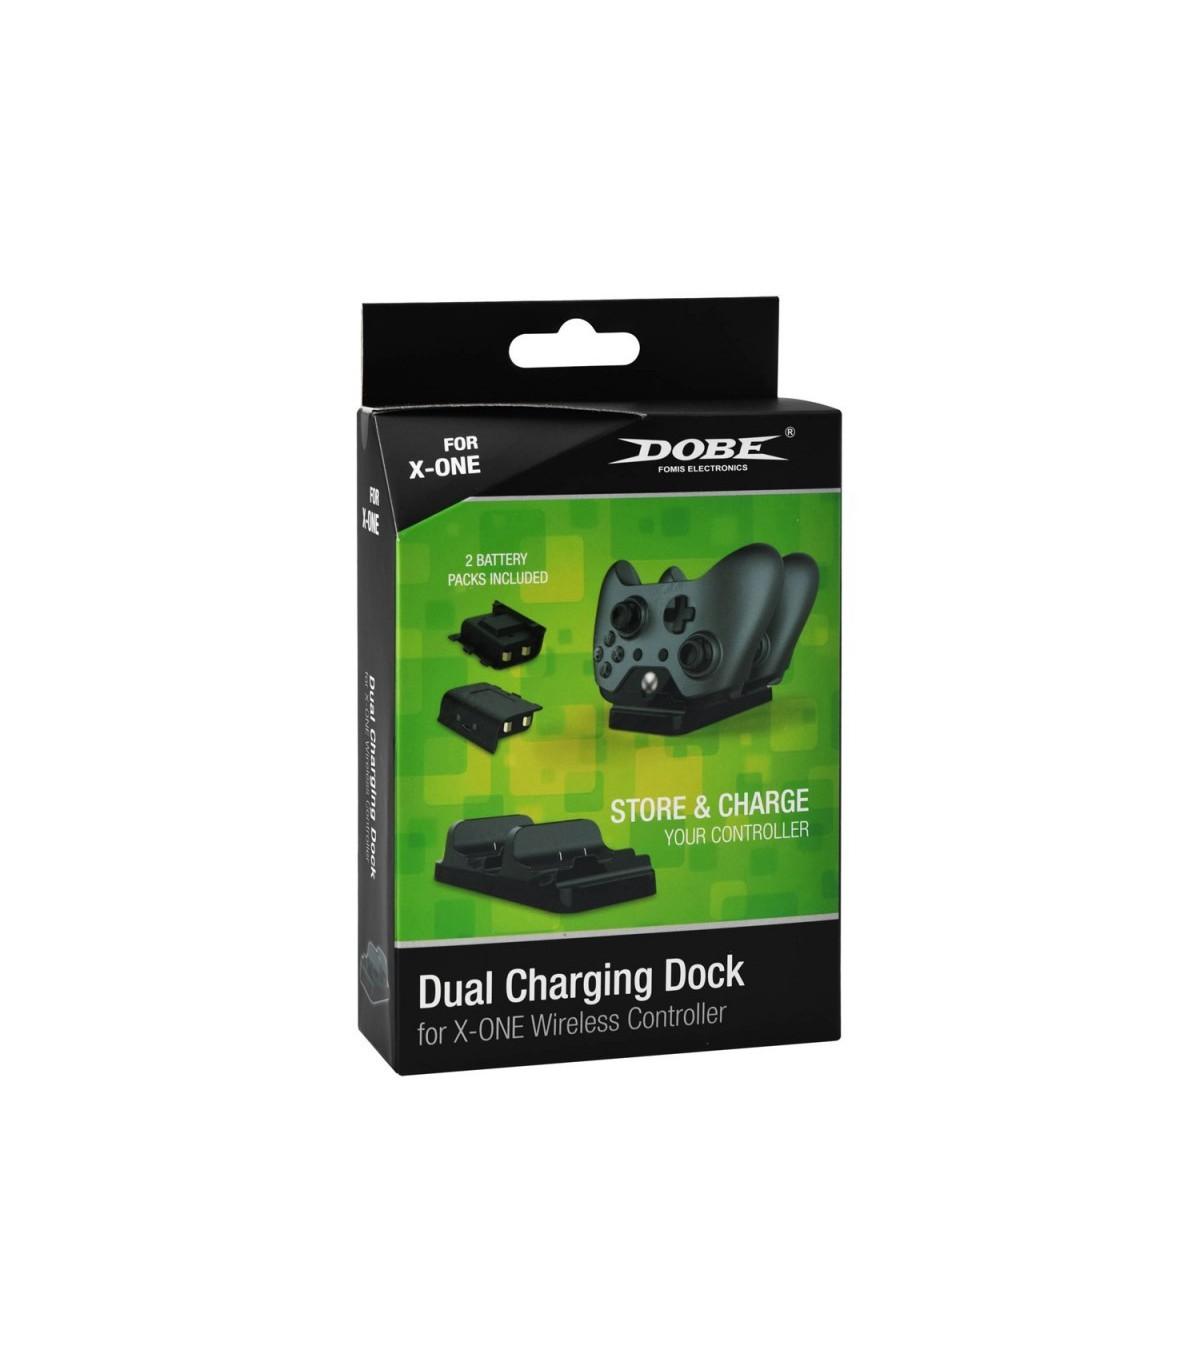 استند شاژر دسته ایکس باکس وان  Dual Chargin Dock Xbox One Controller